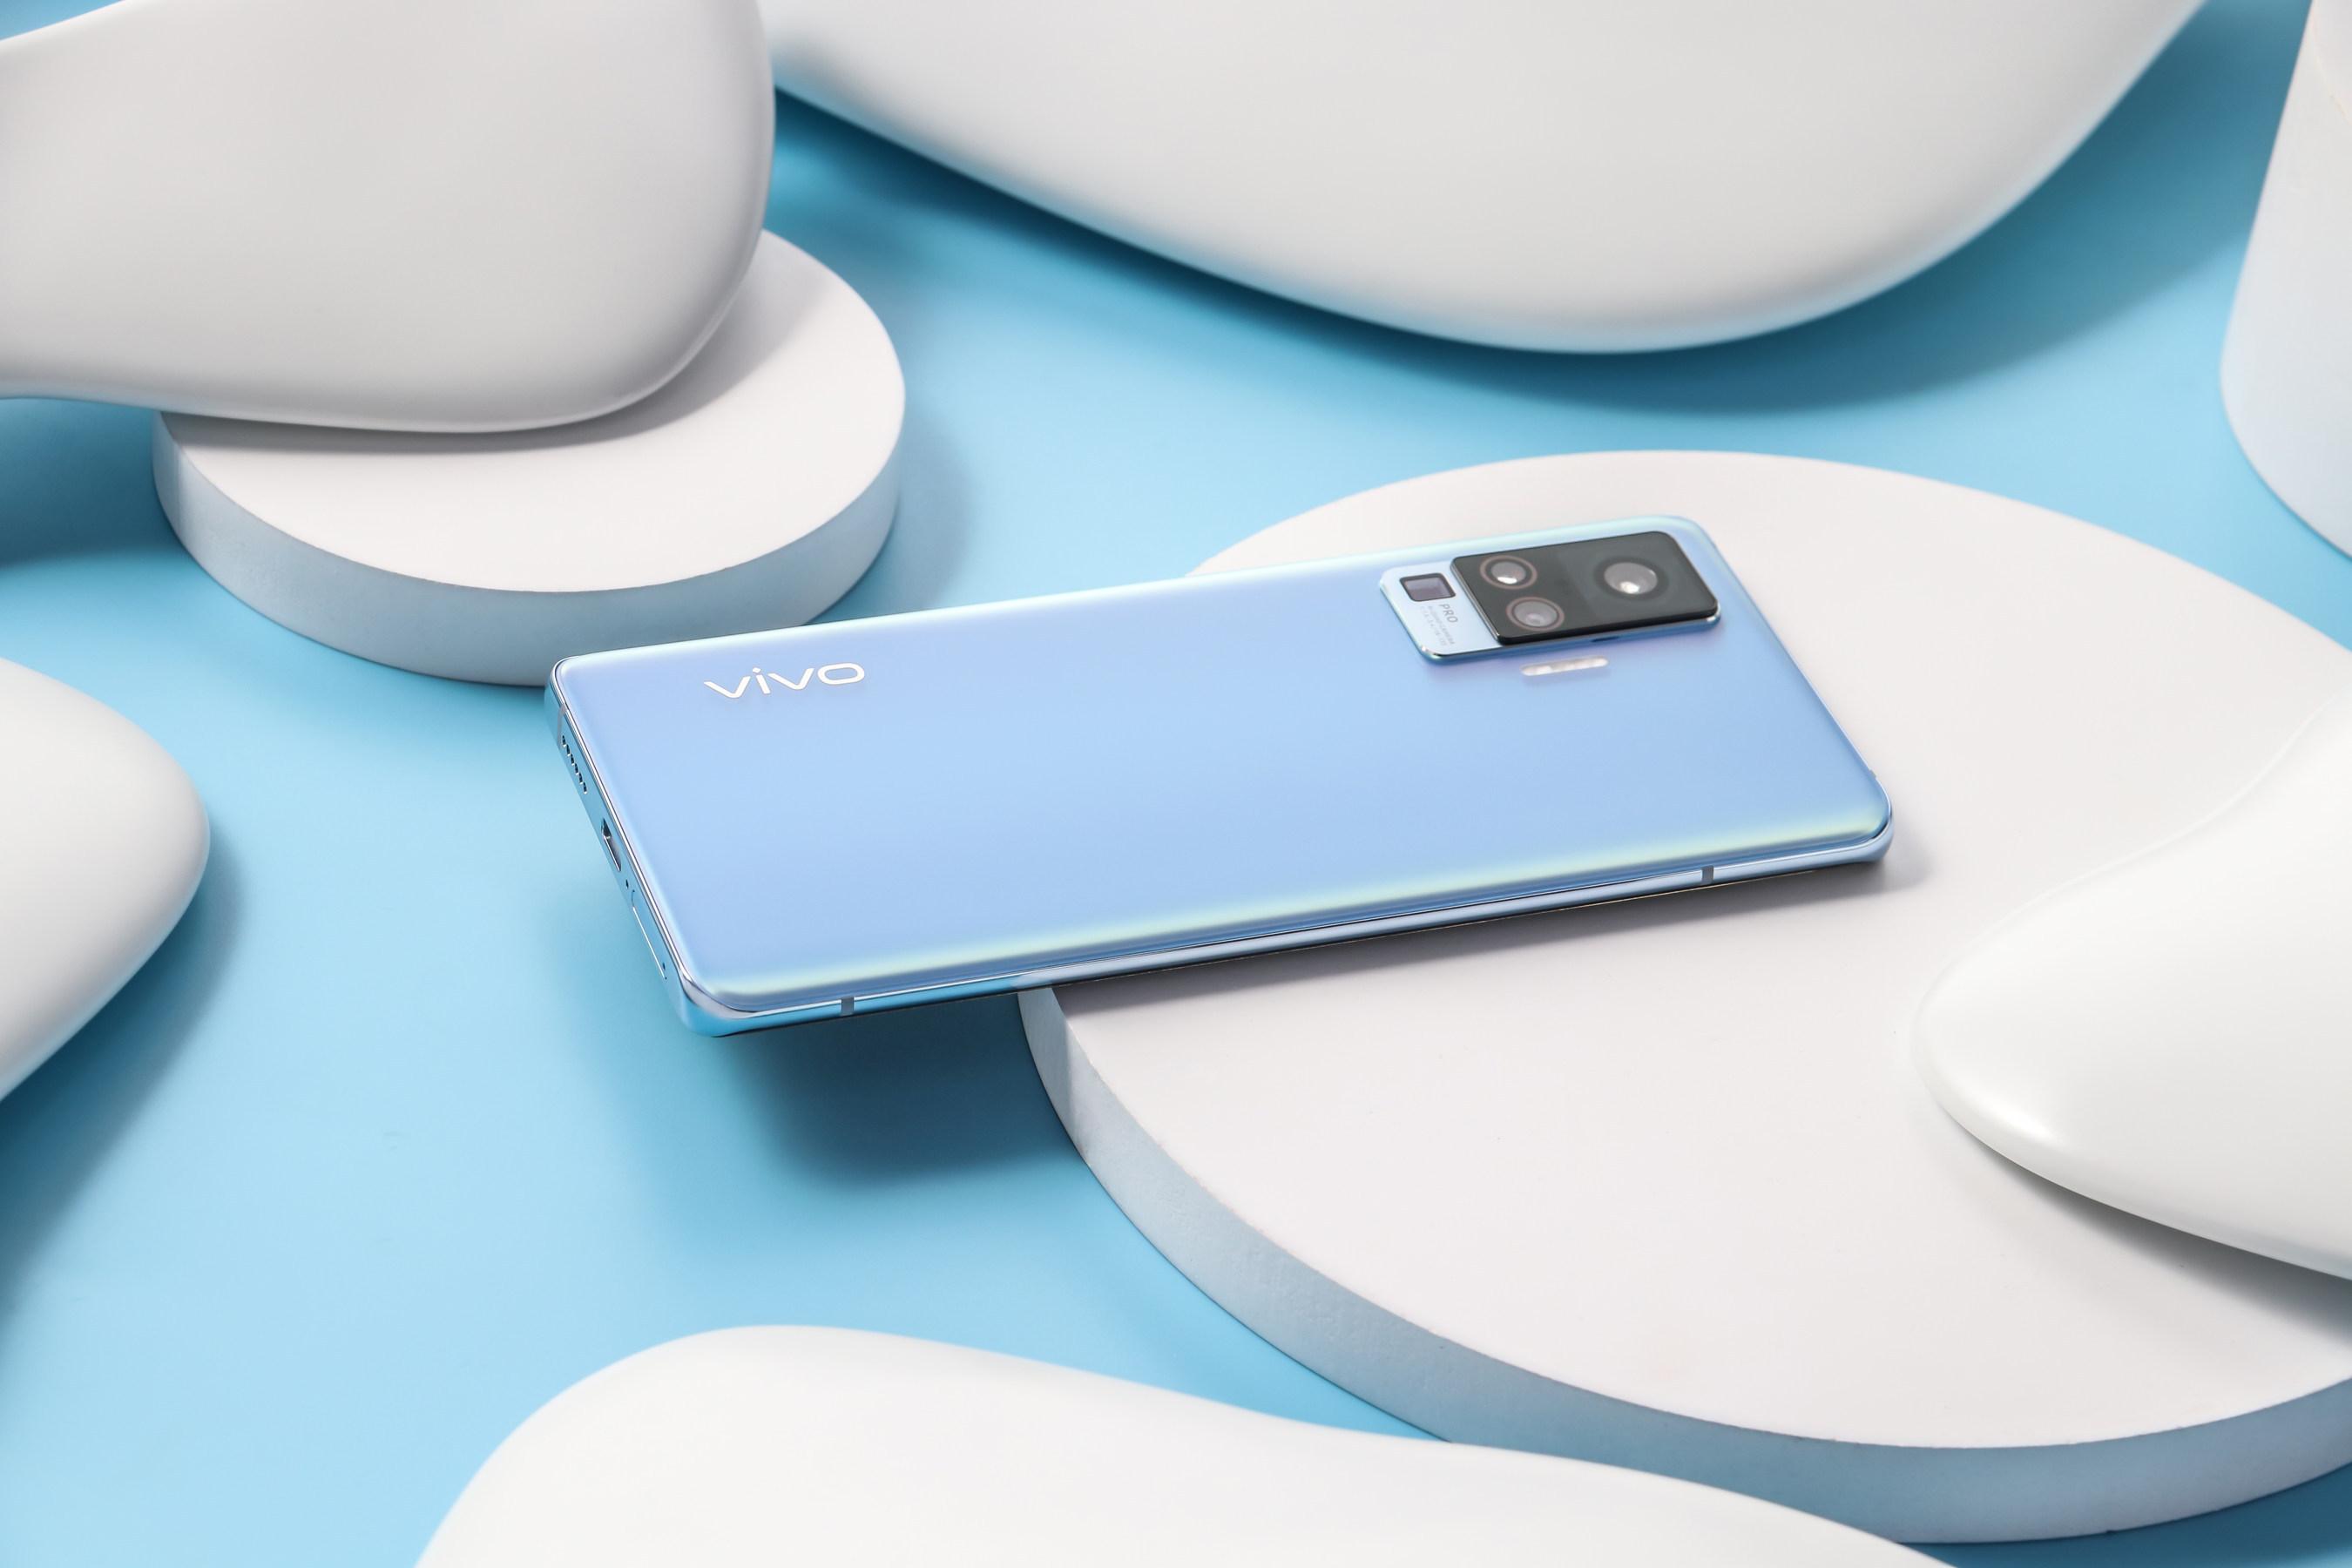 Vivo X50 Pro - smartfon z gimbalem w kamerze zaprezentowany 19